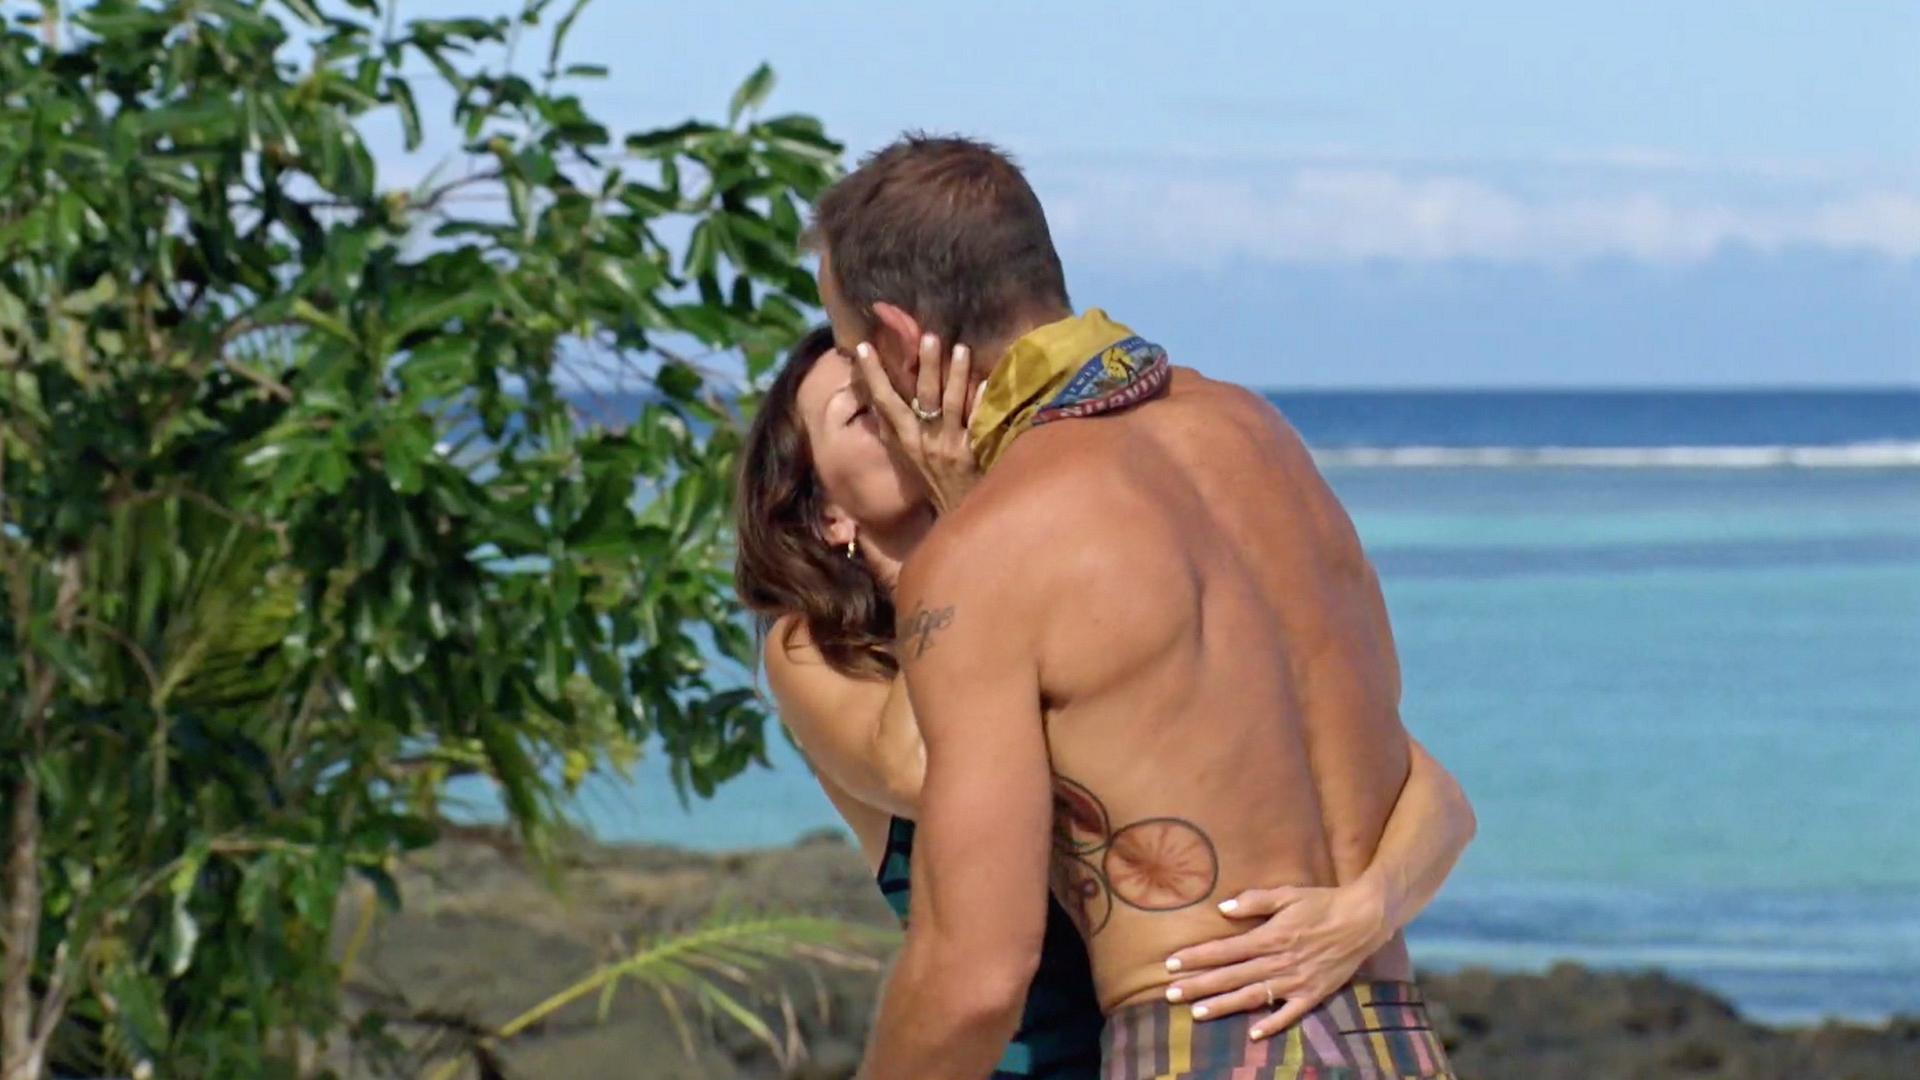 Season 34: Brad Culpepper plants a kiss on his wife.